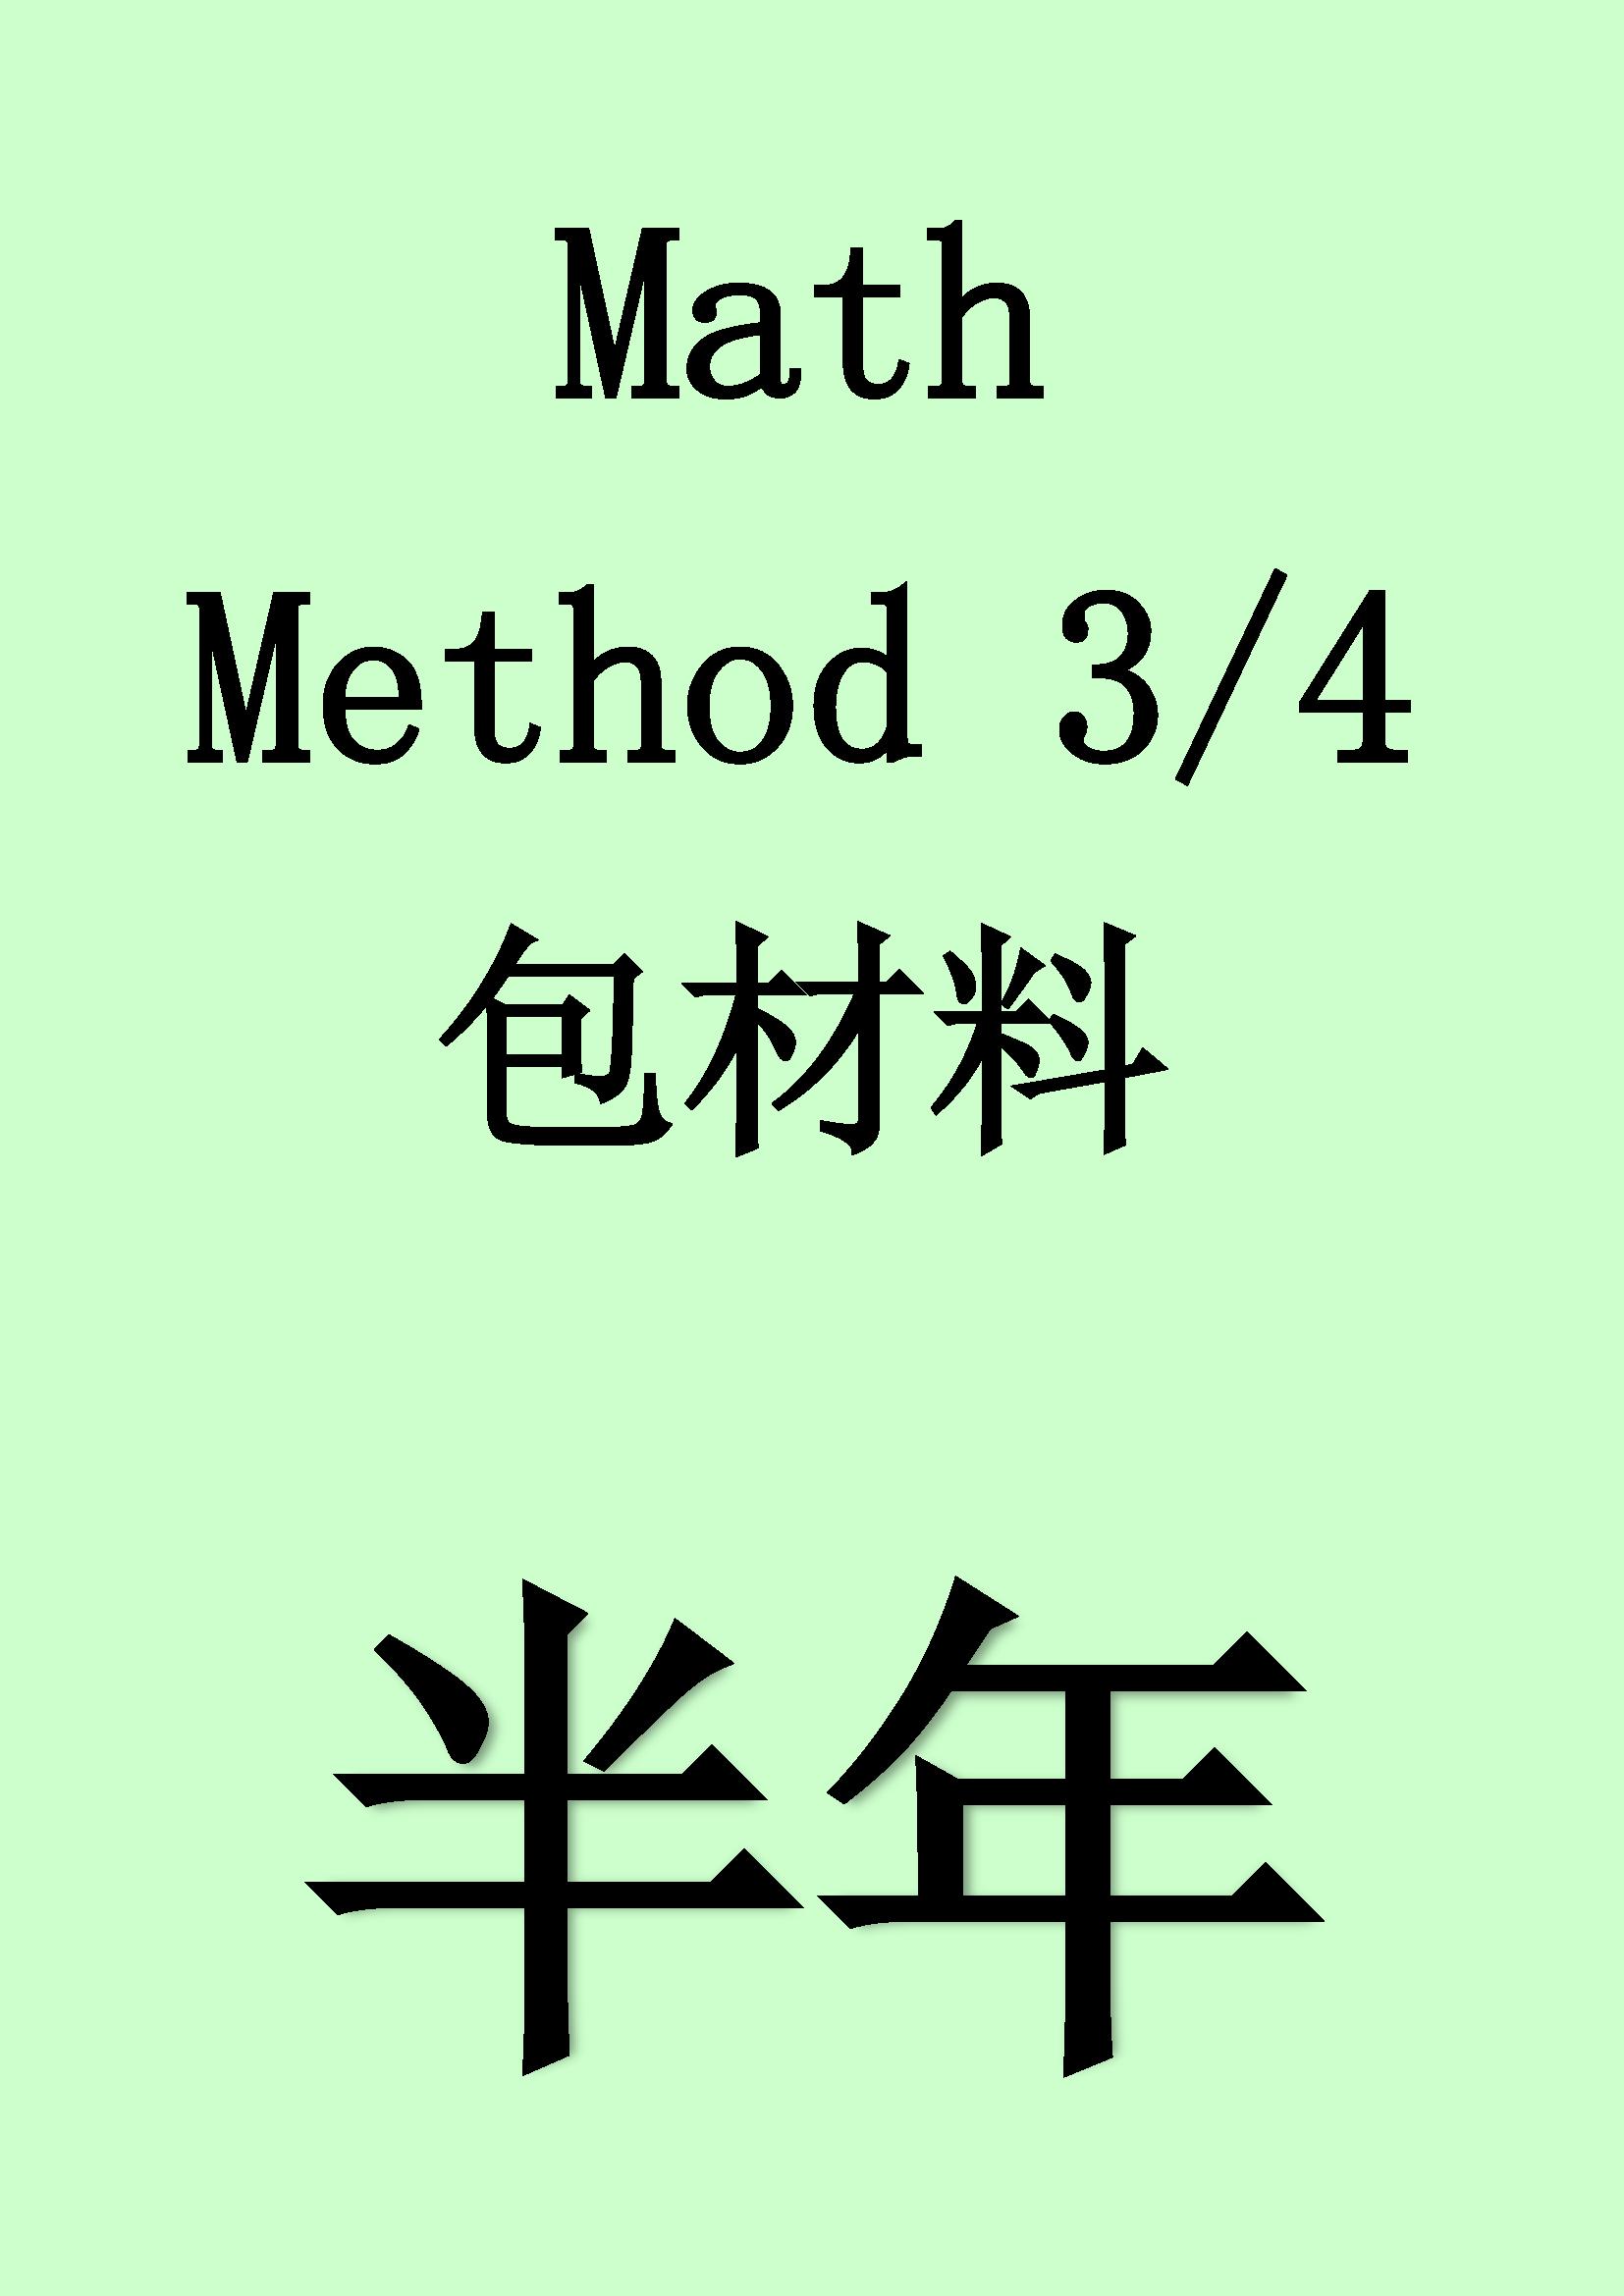 Math Method Unit 3/4 Half year - Sat Afternoon